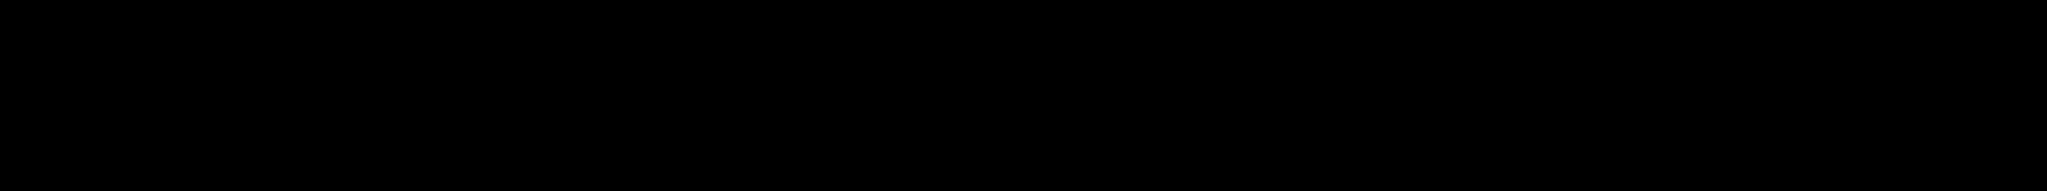 Design System F 500R